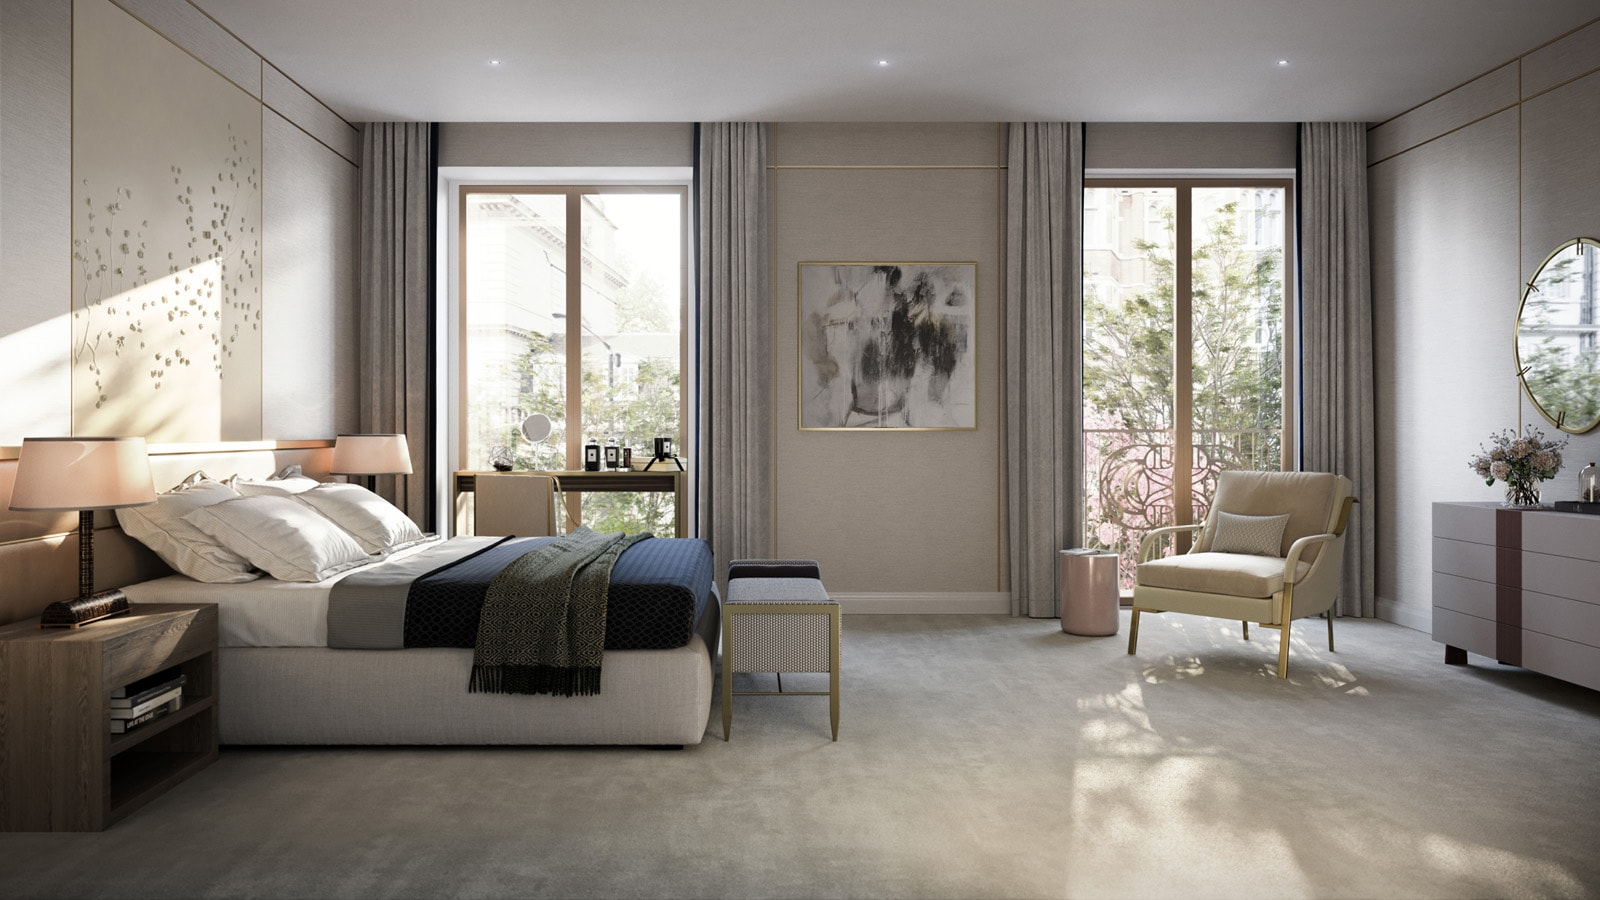 Four Seasons bringt Private Residences nach London 2